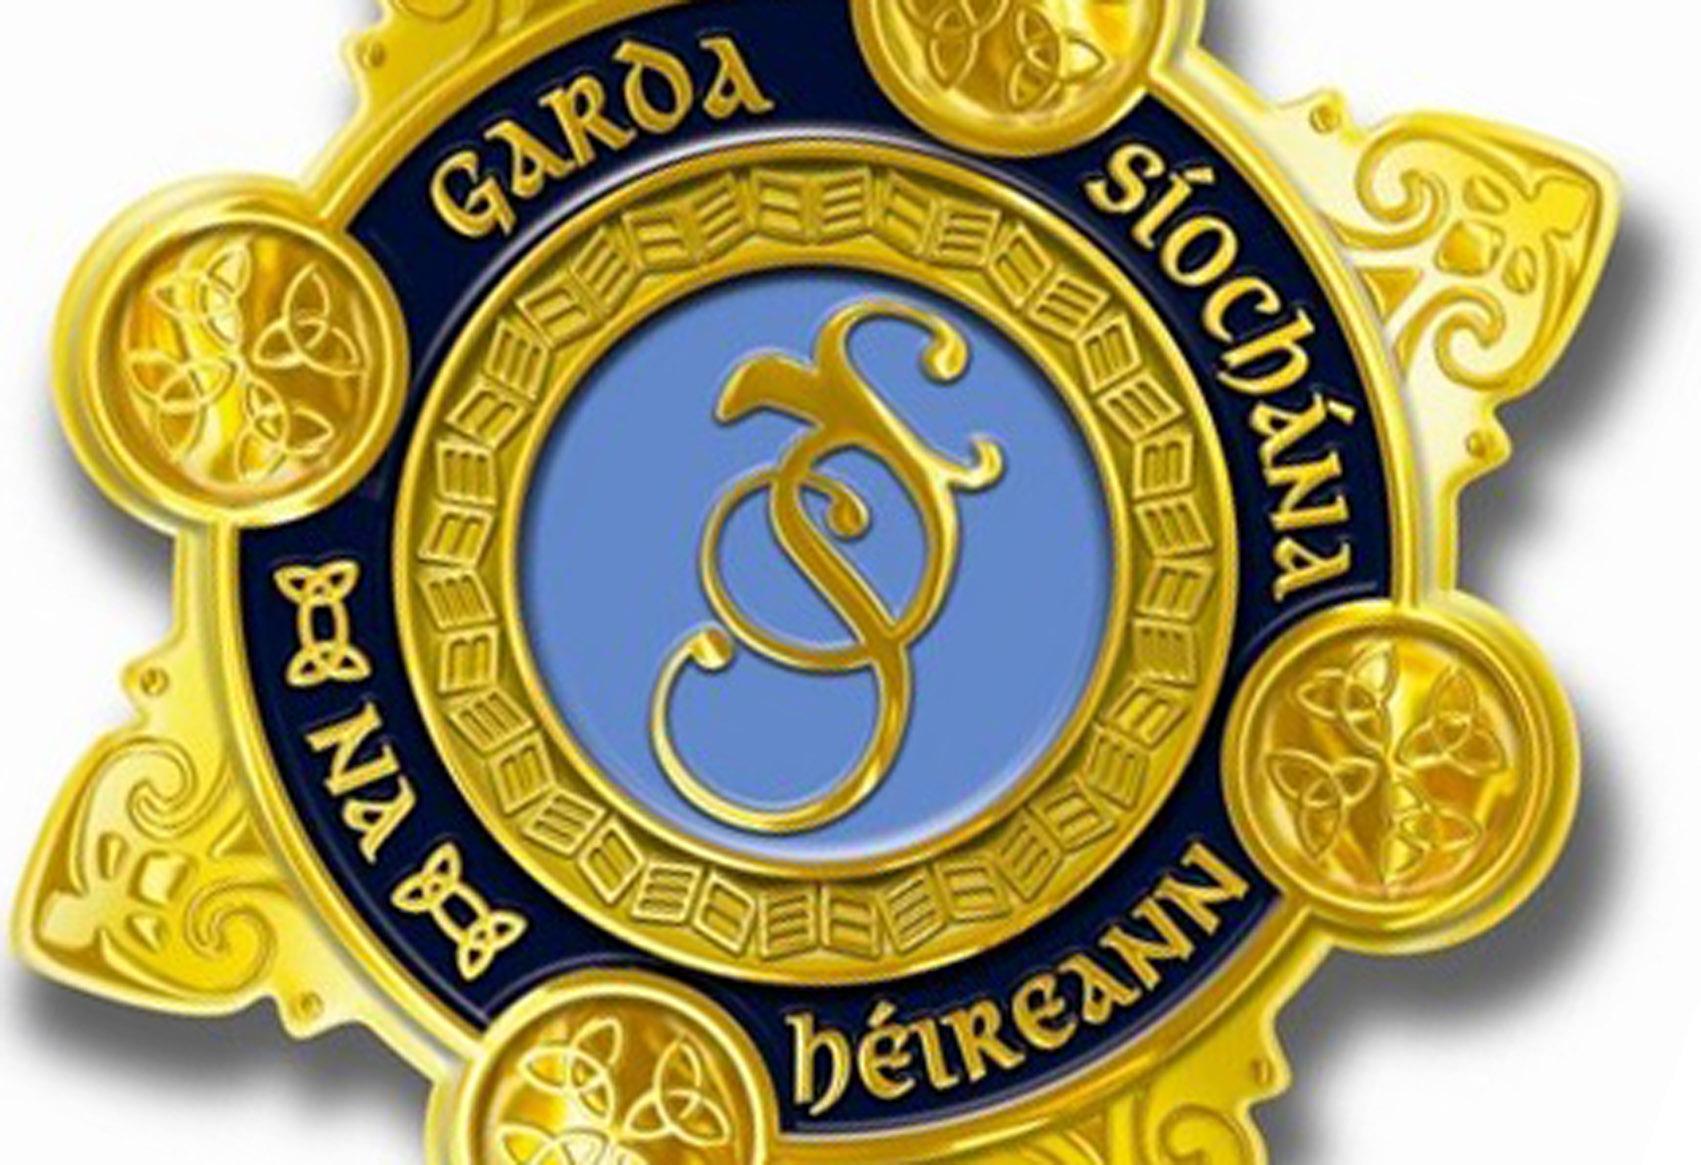 Garda Statement Says Corrective Action Taken on Breath Testing